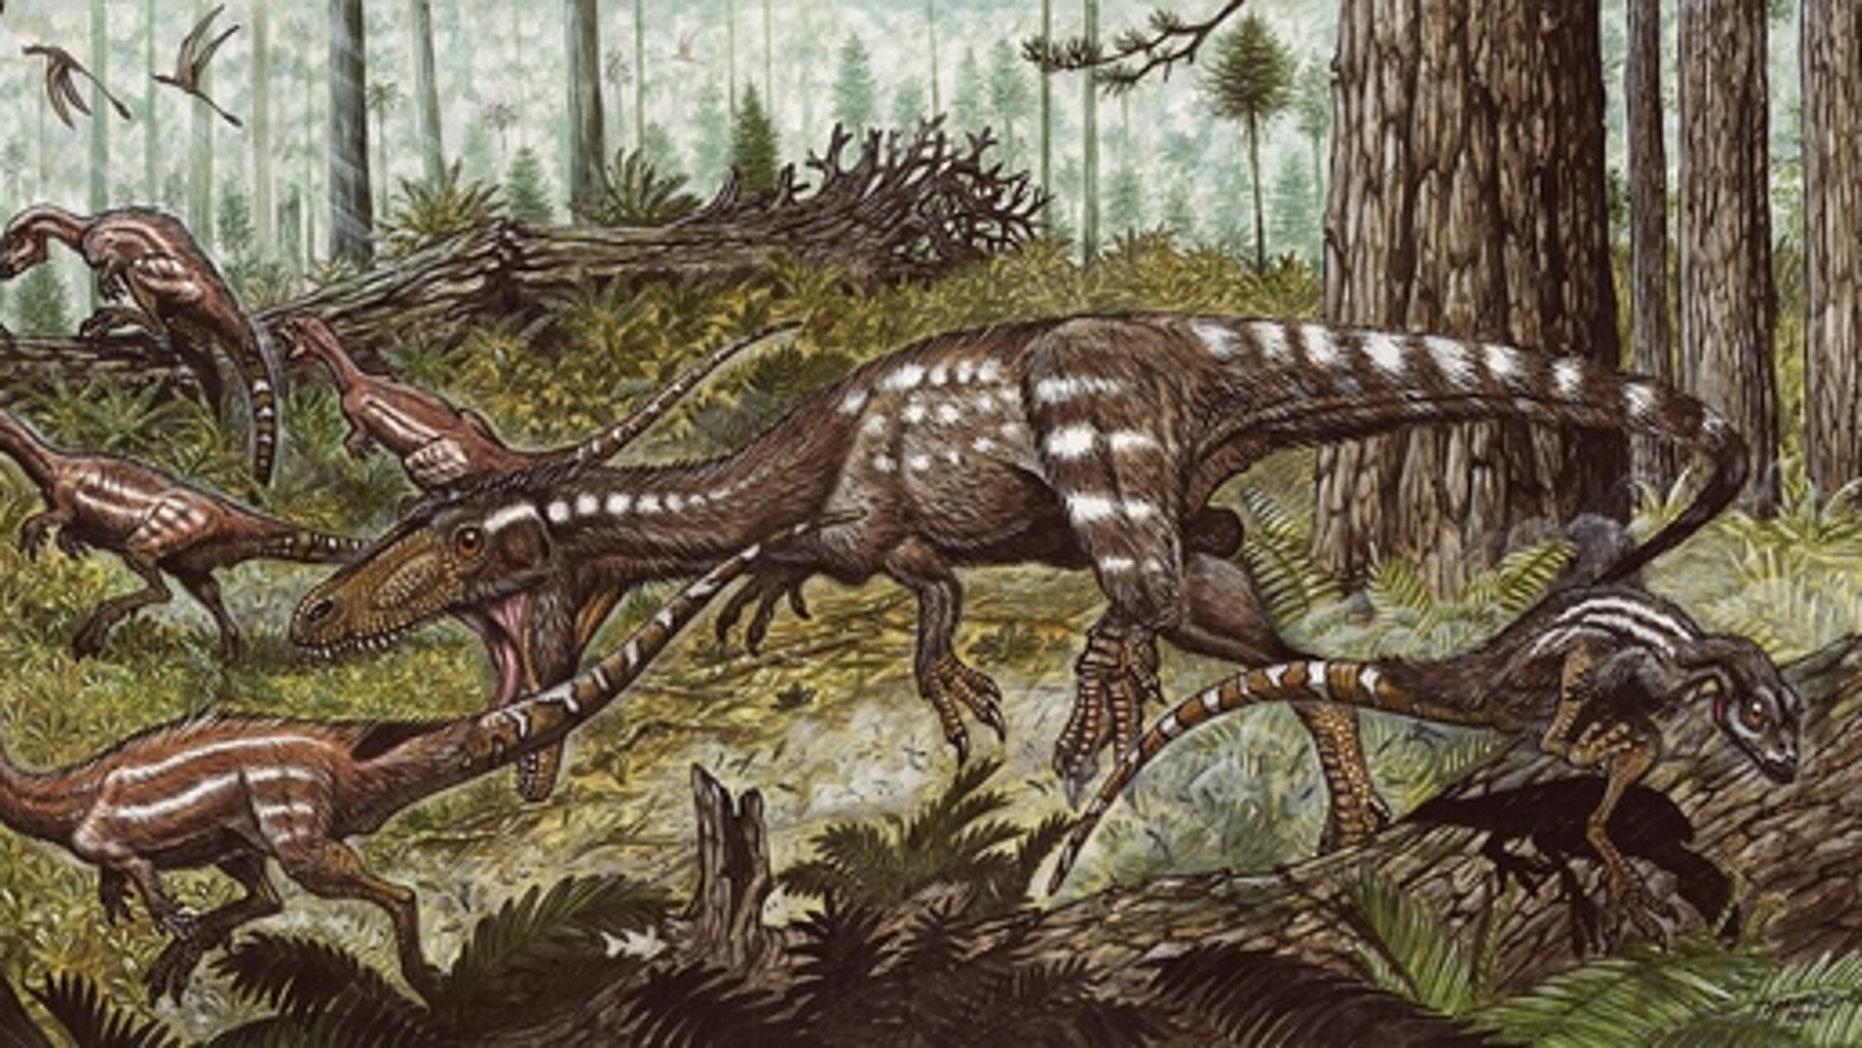 The predatory dinosaur <em>Tachiraptor admirabilis</em>, unearthed in Venezuela, attacking the herbivorous dinosaur <em>Laquintasaura</em>.